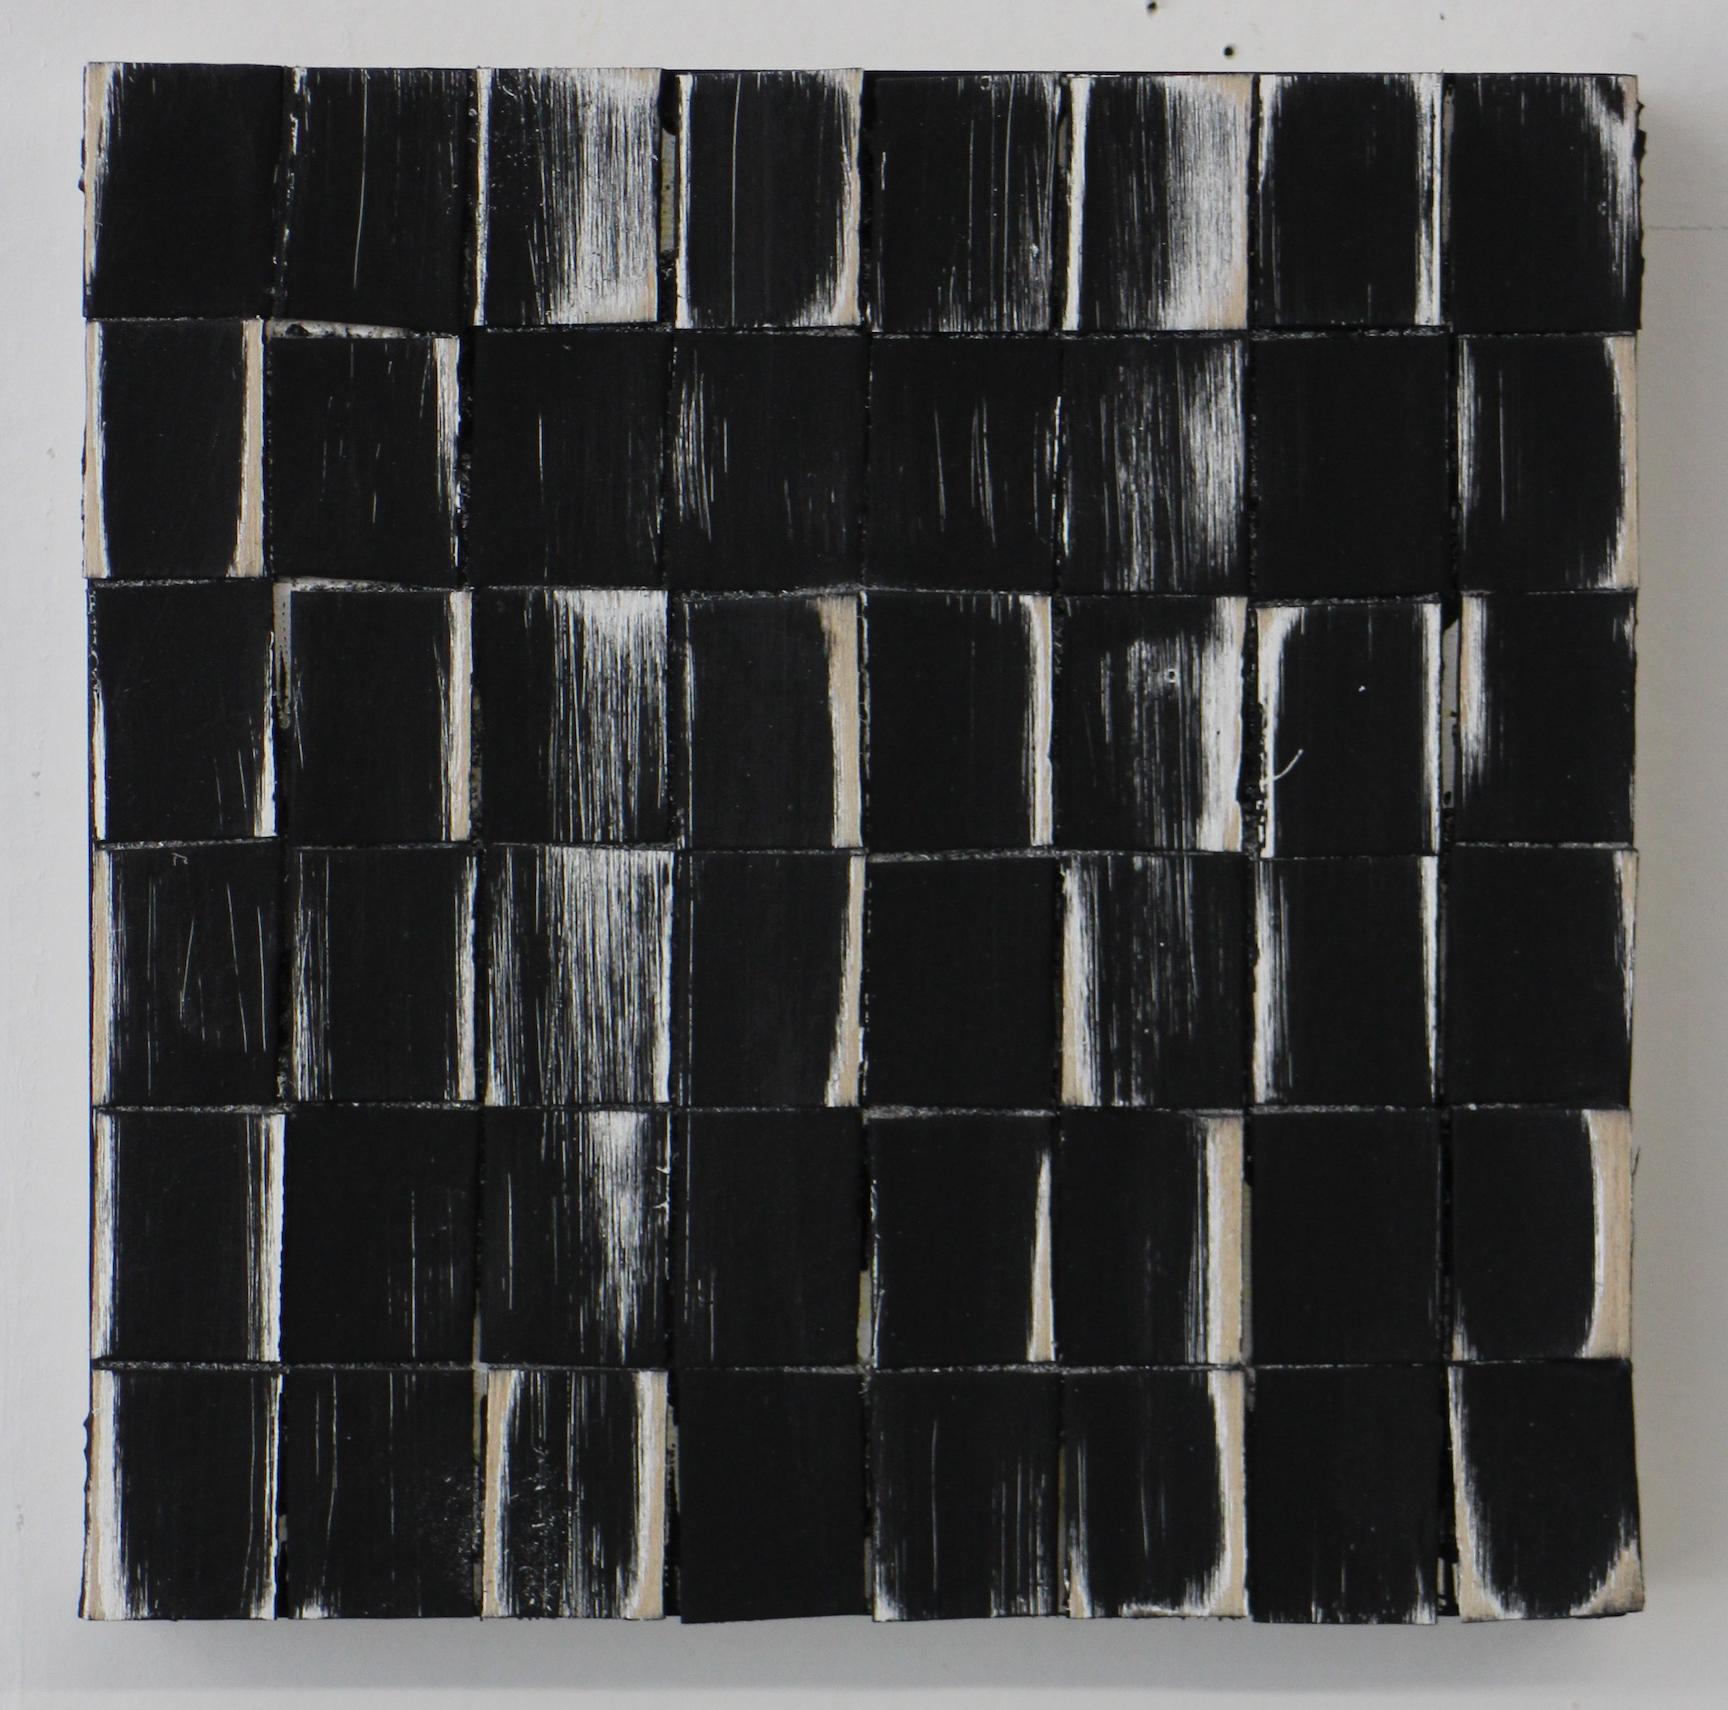 Ryman 5 - Black/White